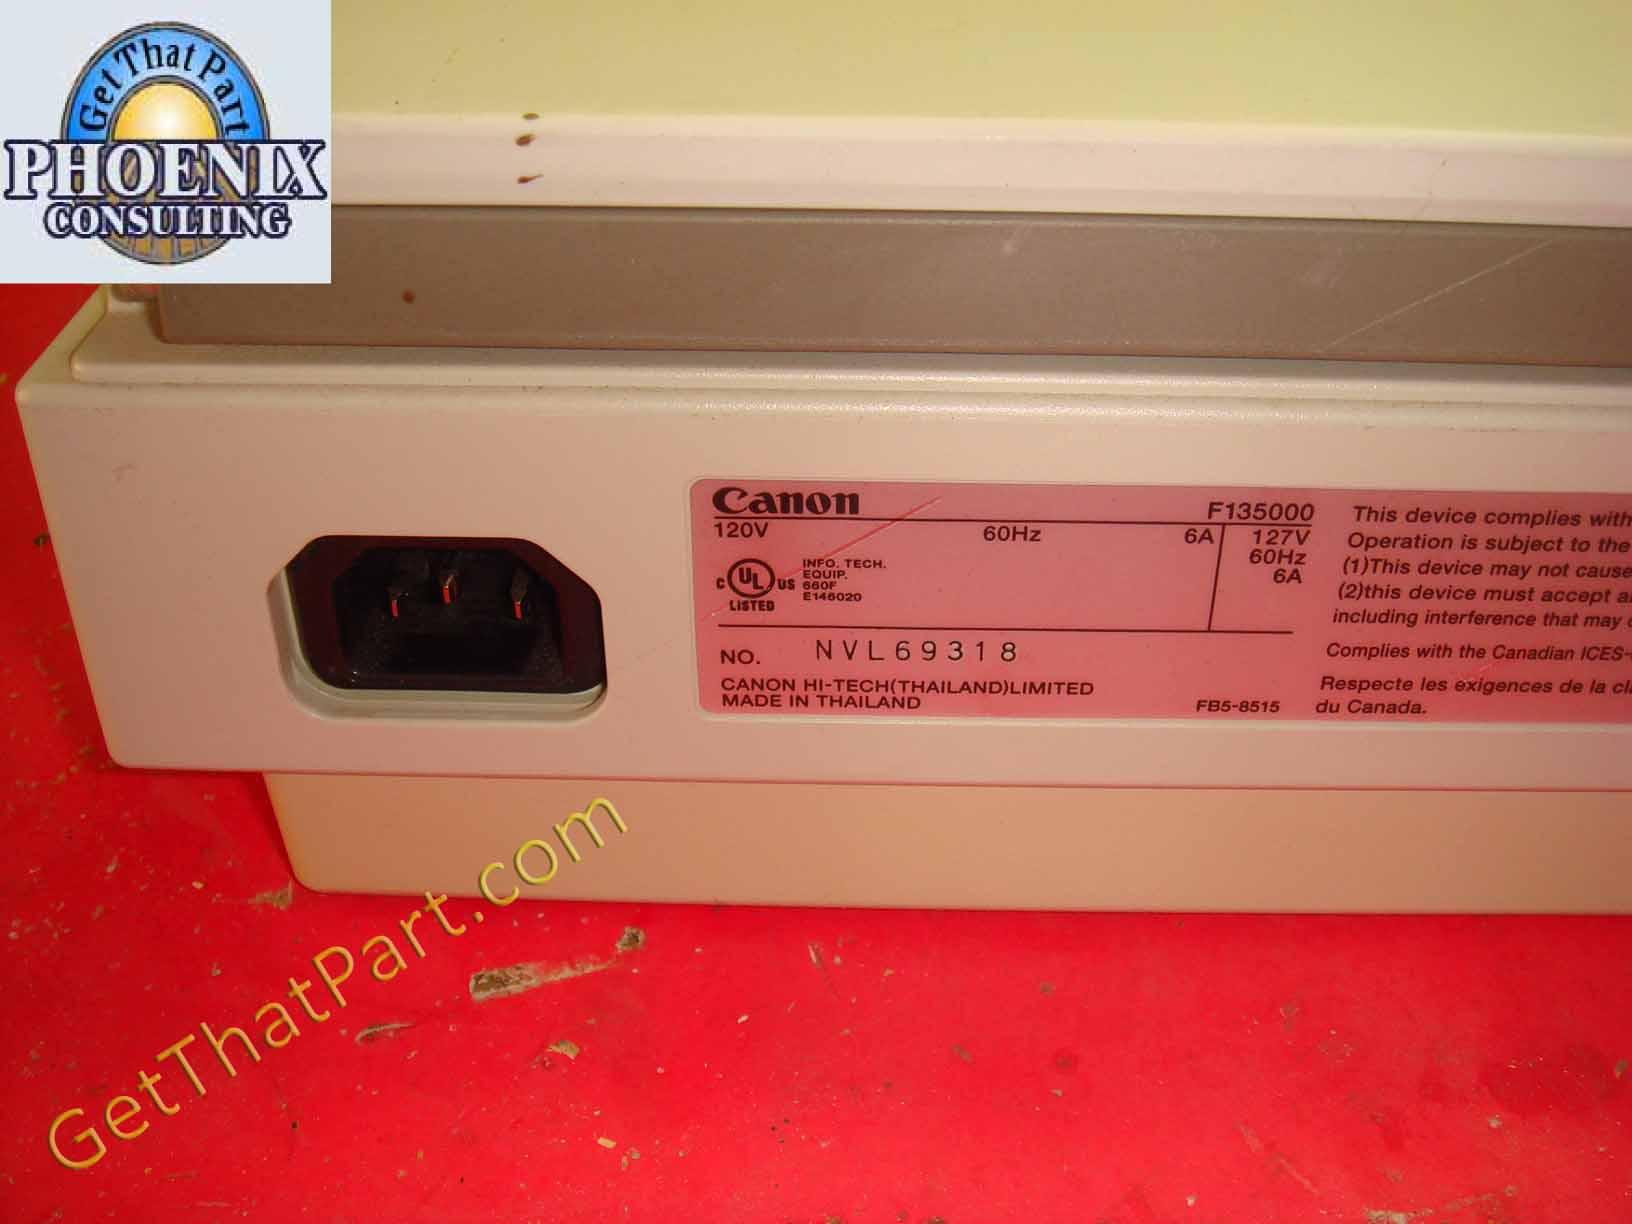 canon pc425 personal desktop tabletop complete copier rh getthatpart com canon pc 420 copier manual Canon Speedlite 420EX